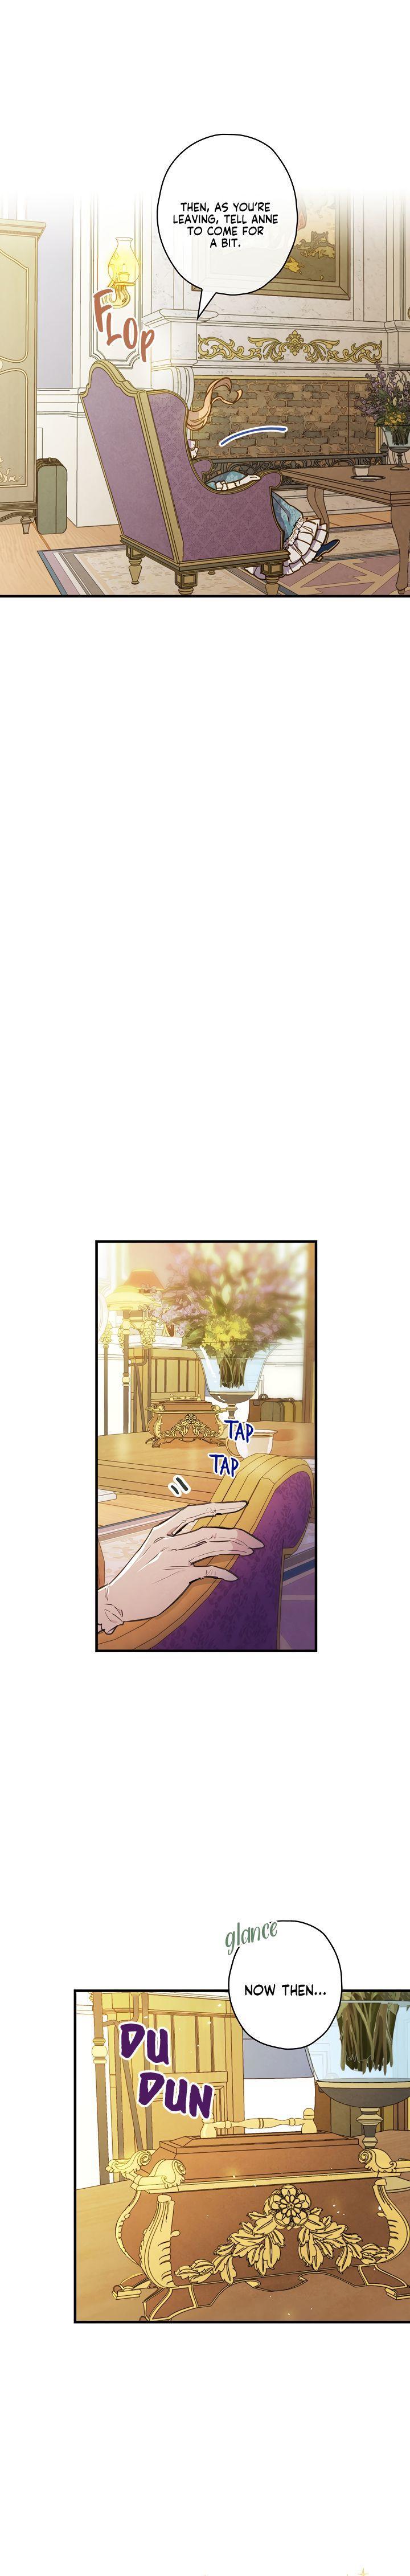 Shadow Queen Chapter 33 page 10 - Mangakakalots.com